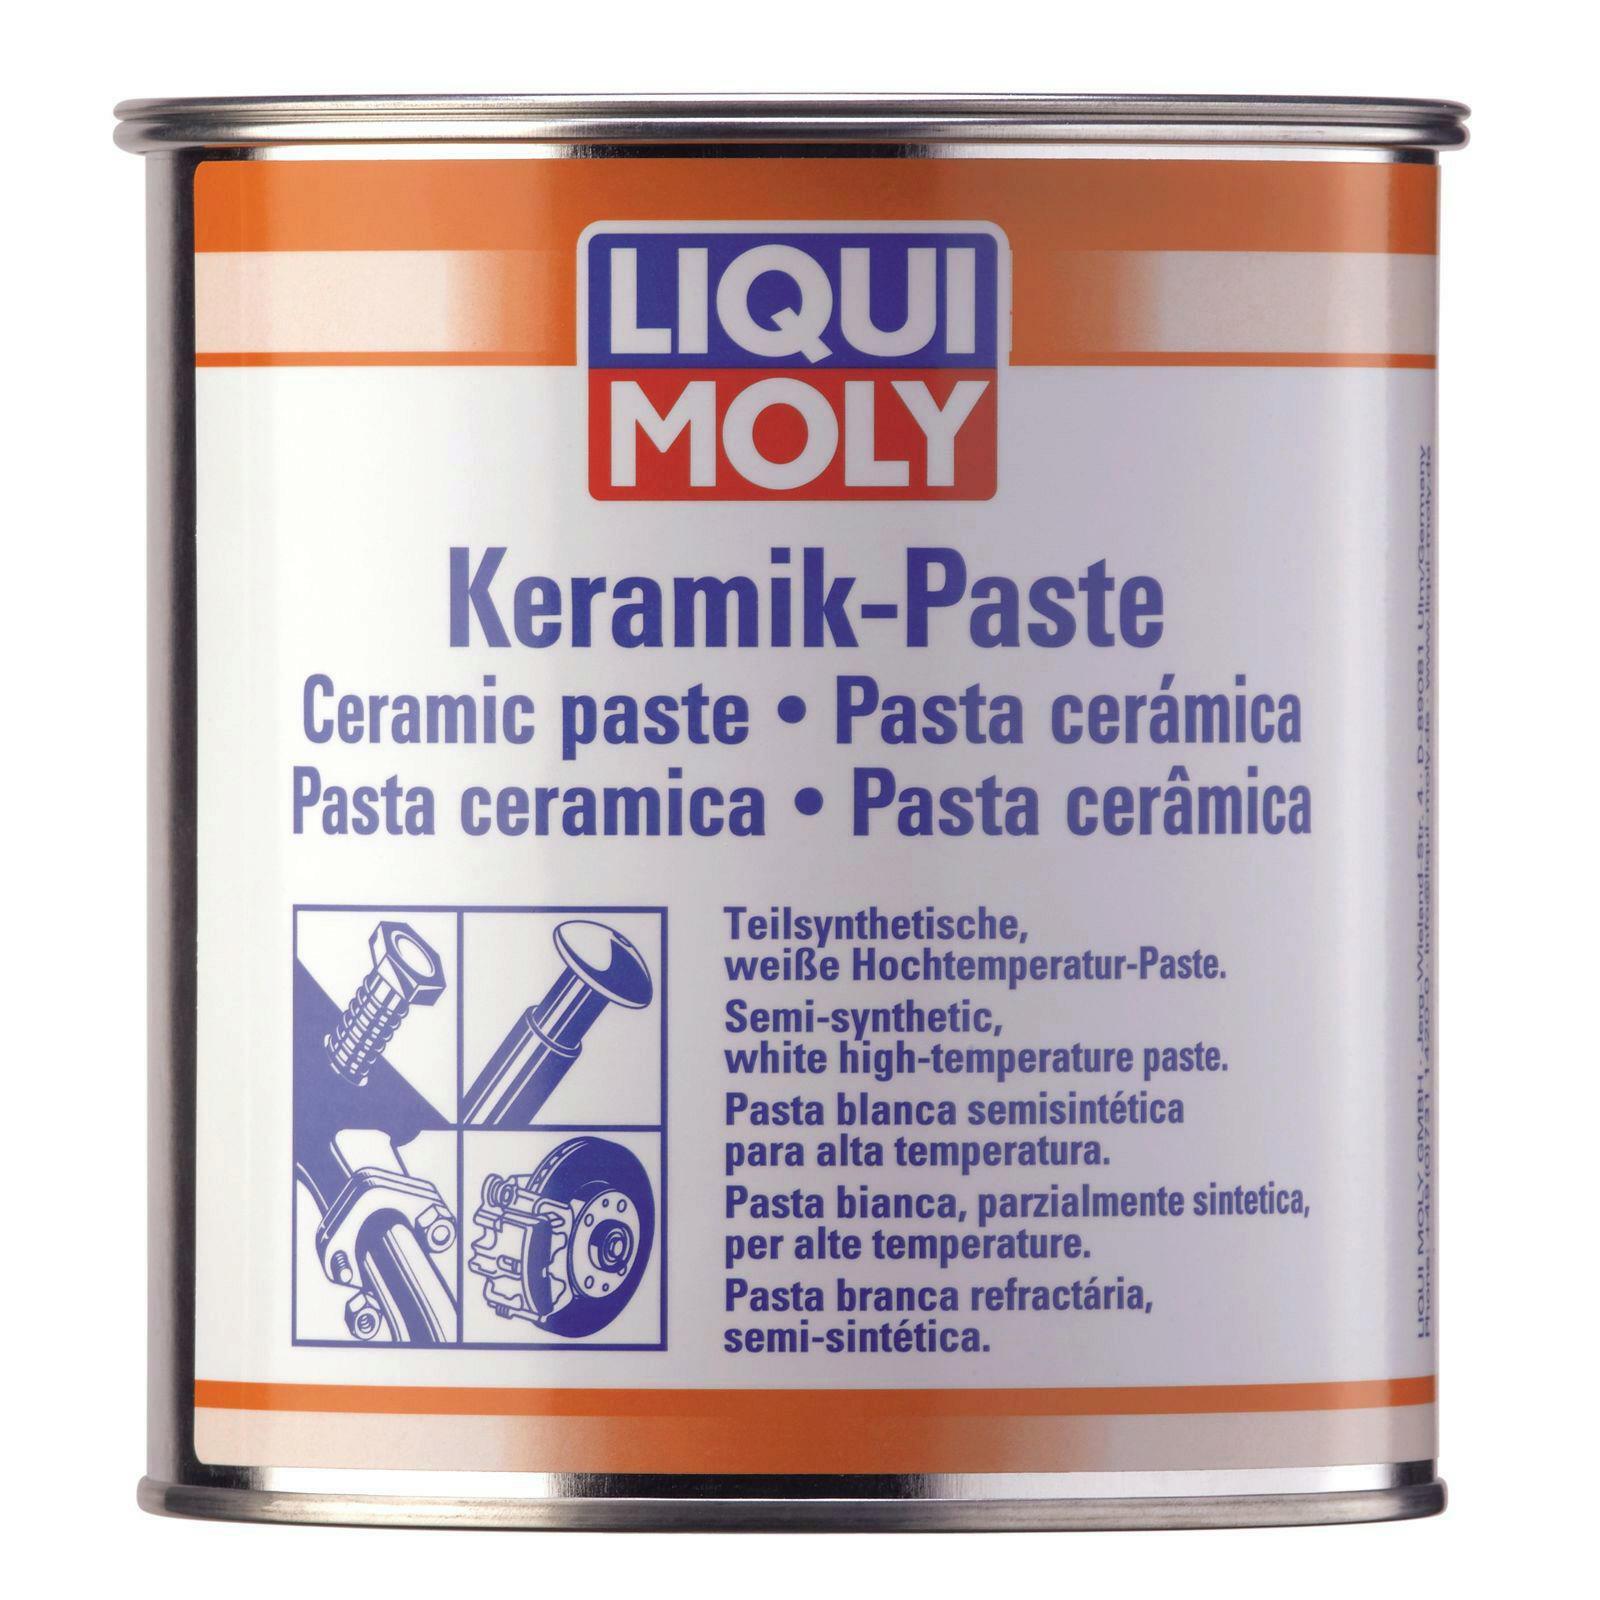 Liqui Moly Keramik-Paste 1kg